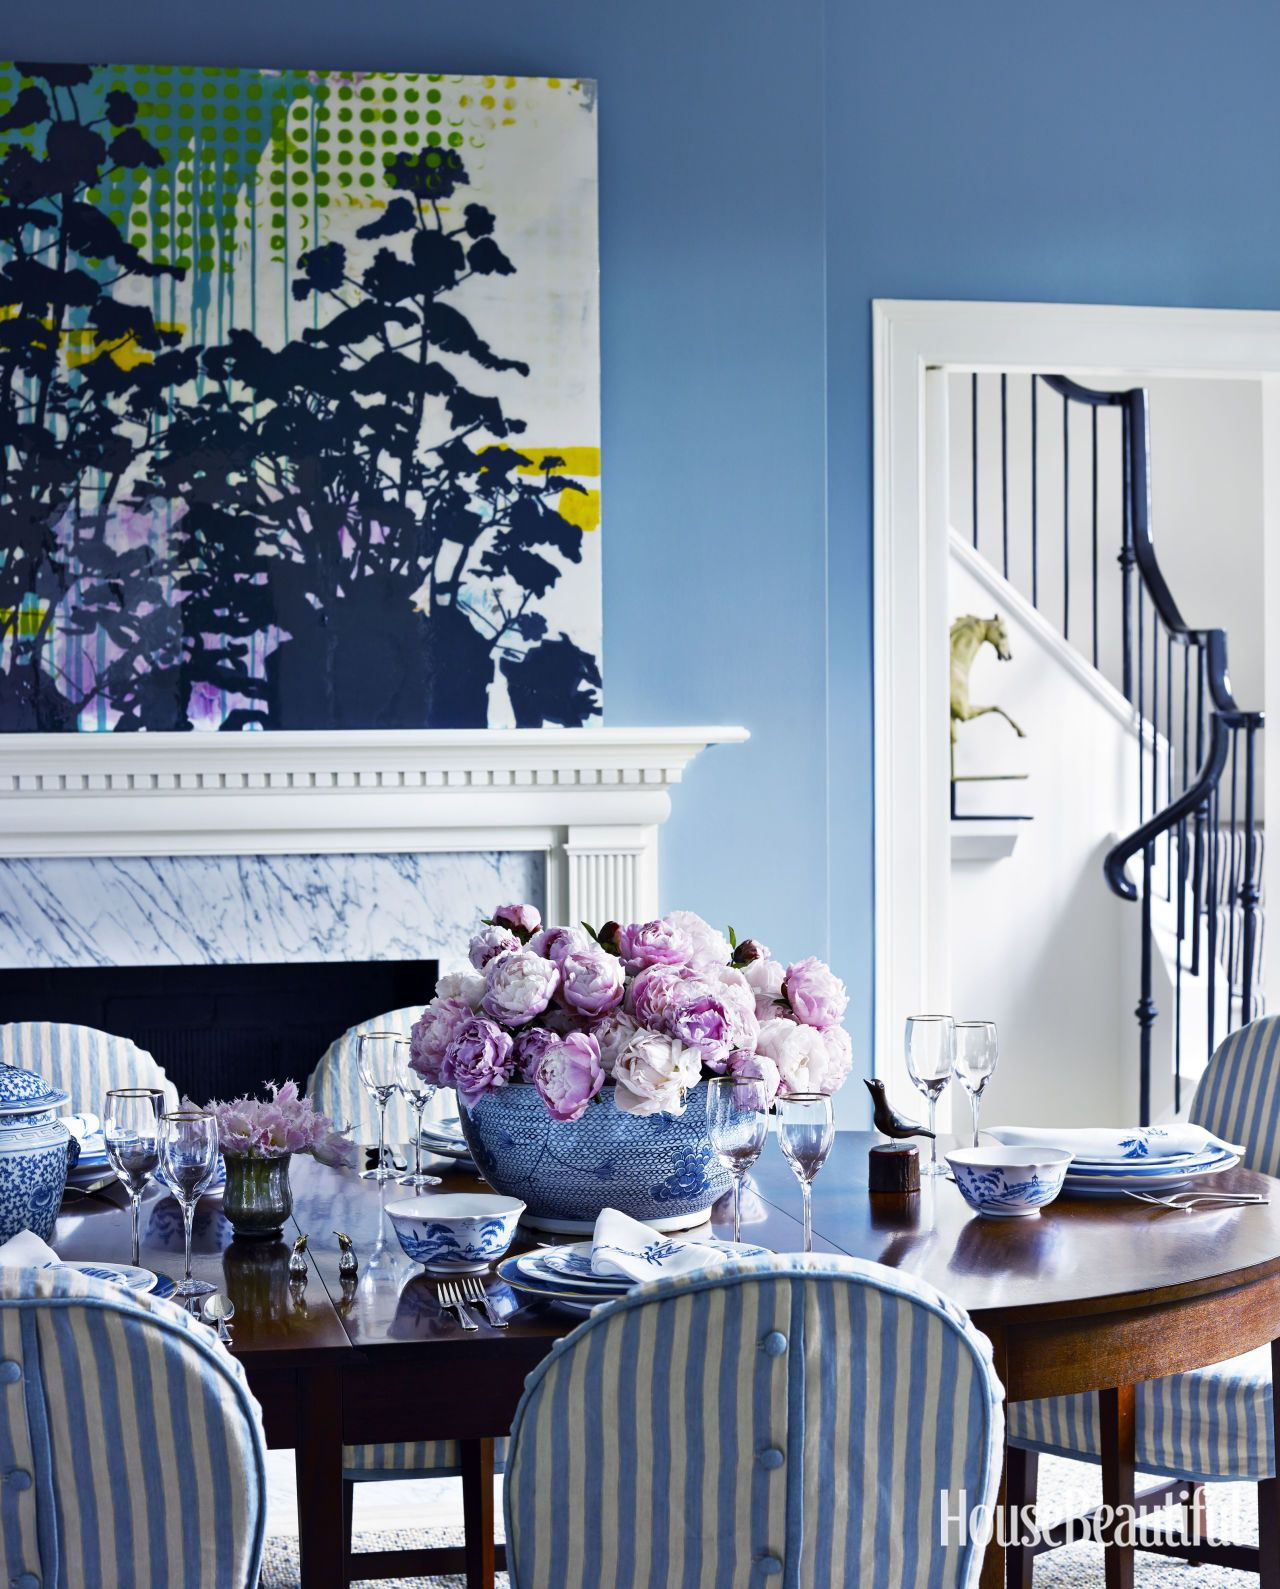 A Little Design Trickery Creates a Serene, Symmetrical Space ...